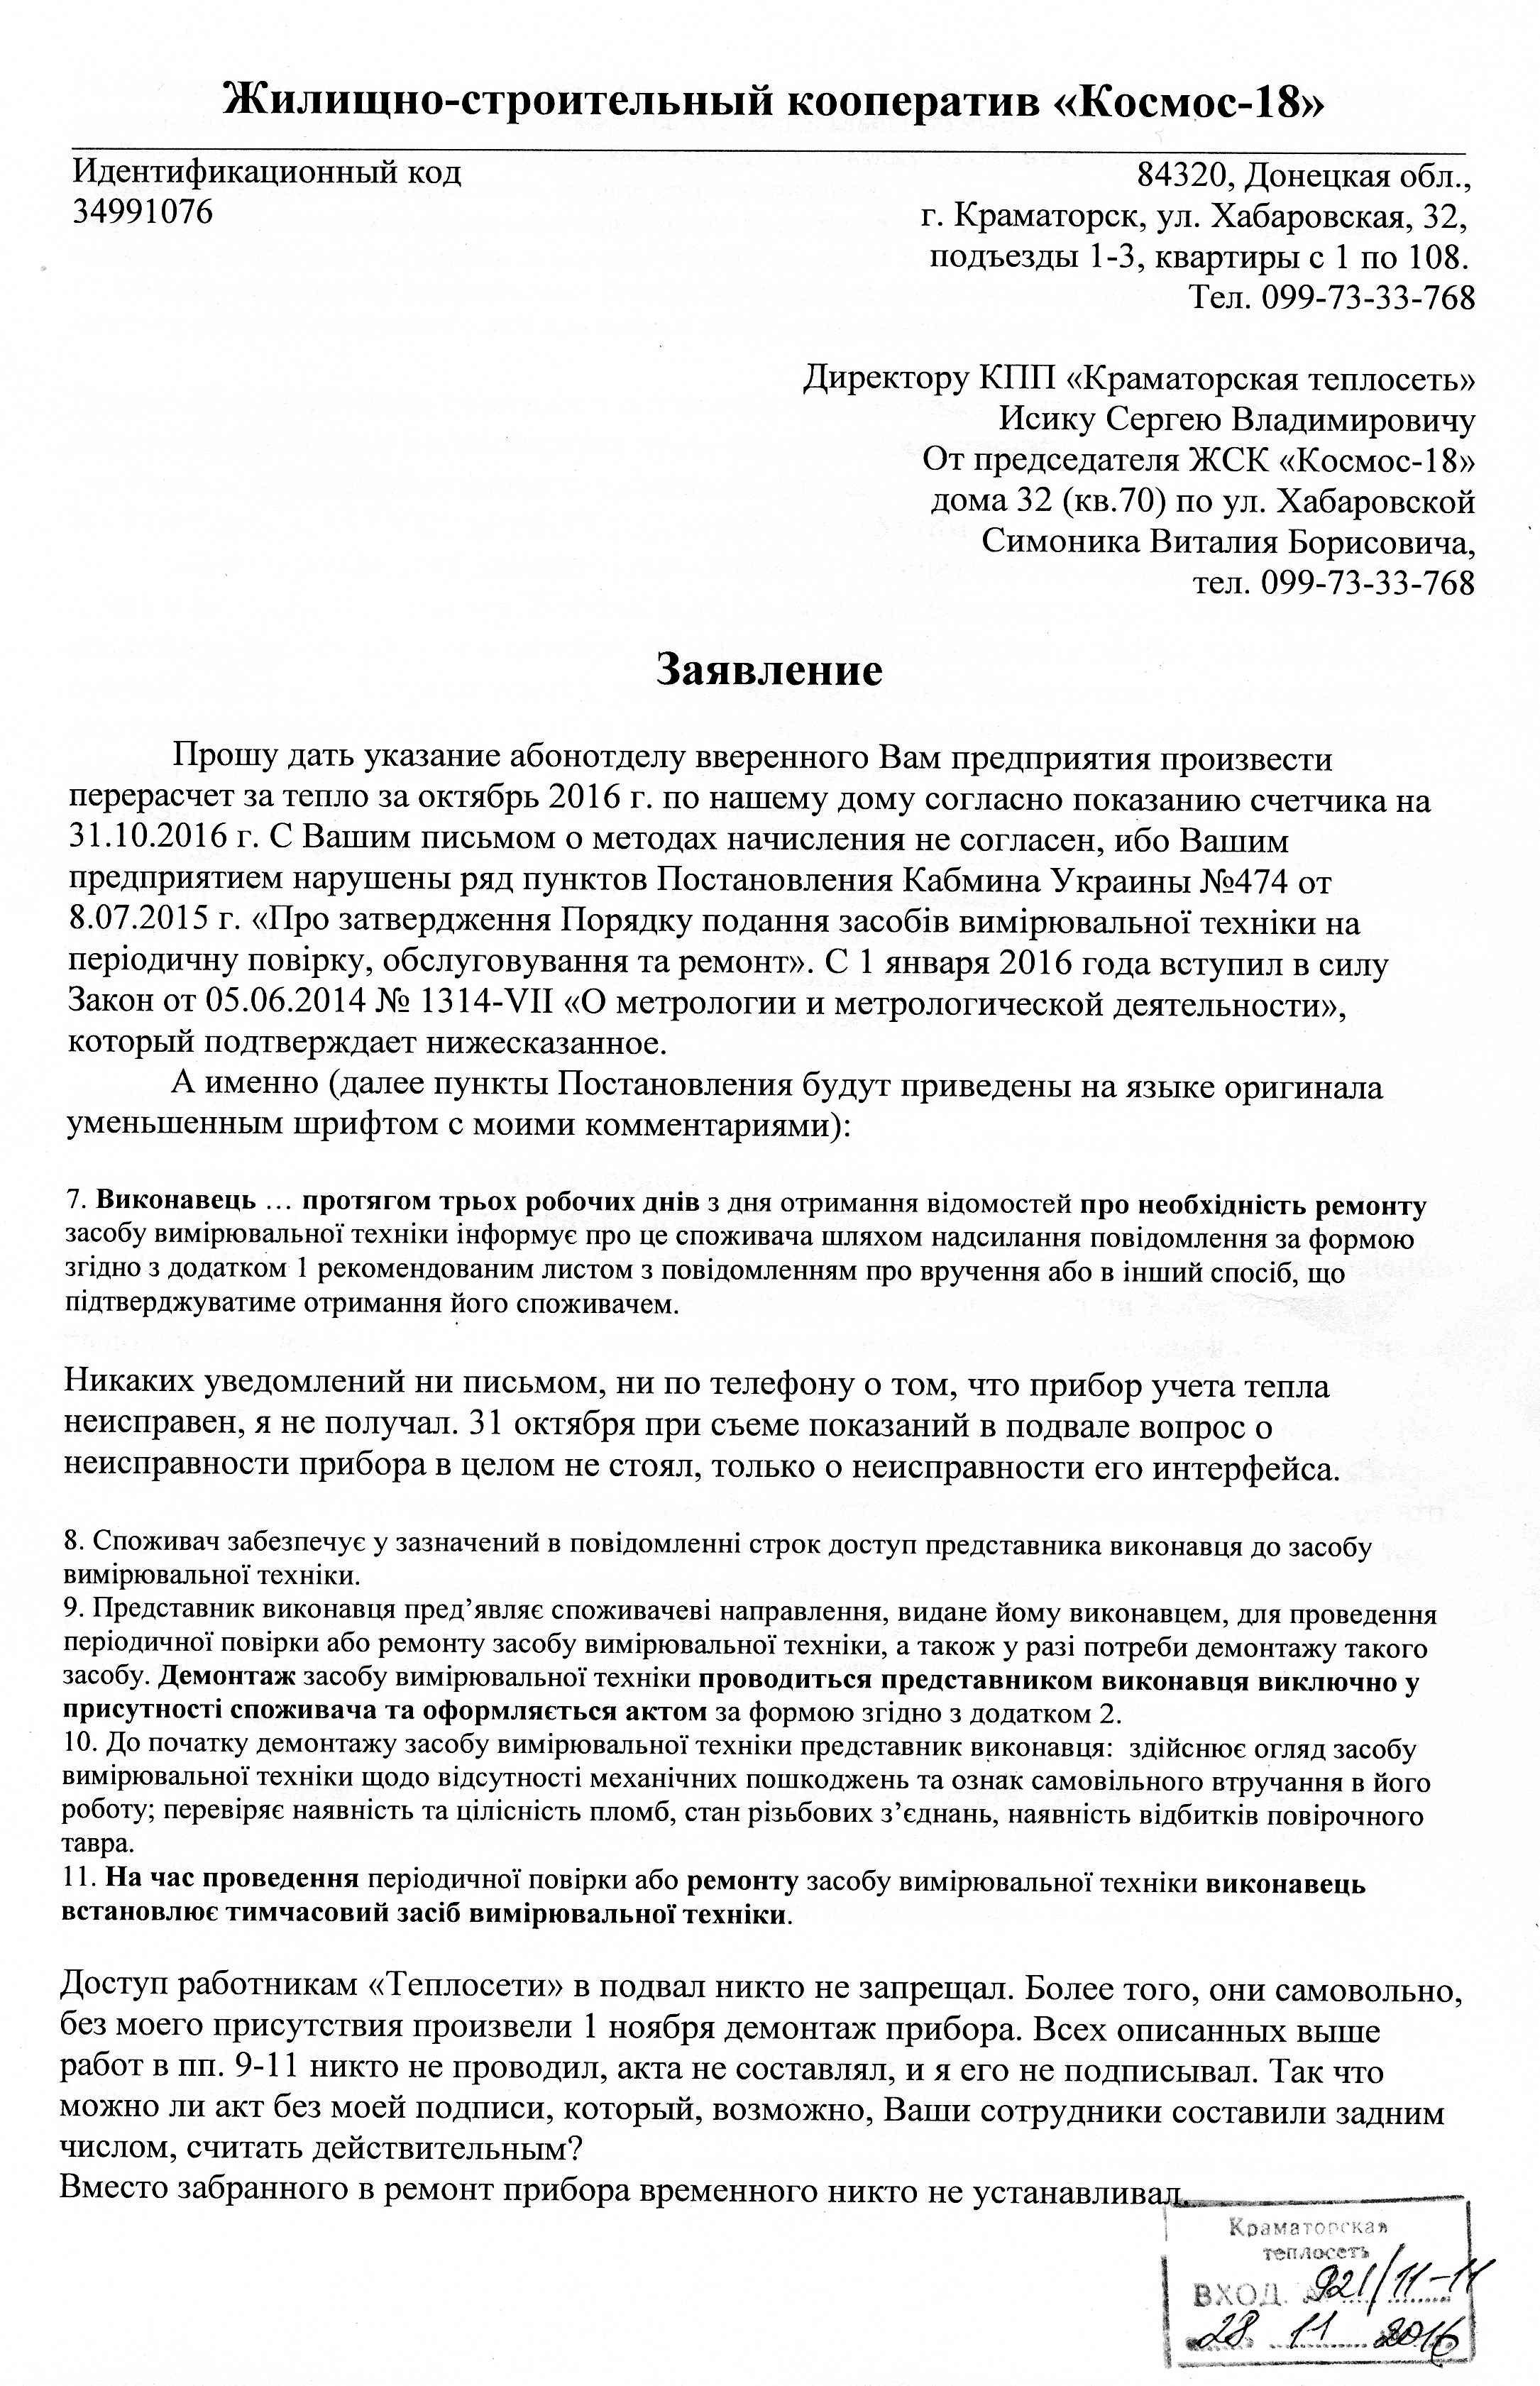 https://img-fotki.yandex.ru/get/113961/248142895.0/0_180ff0_f62c7257_orig